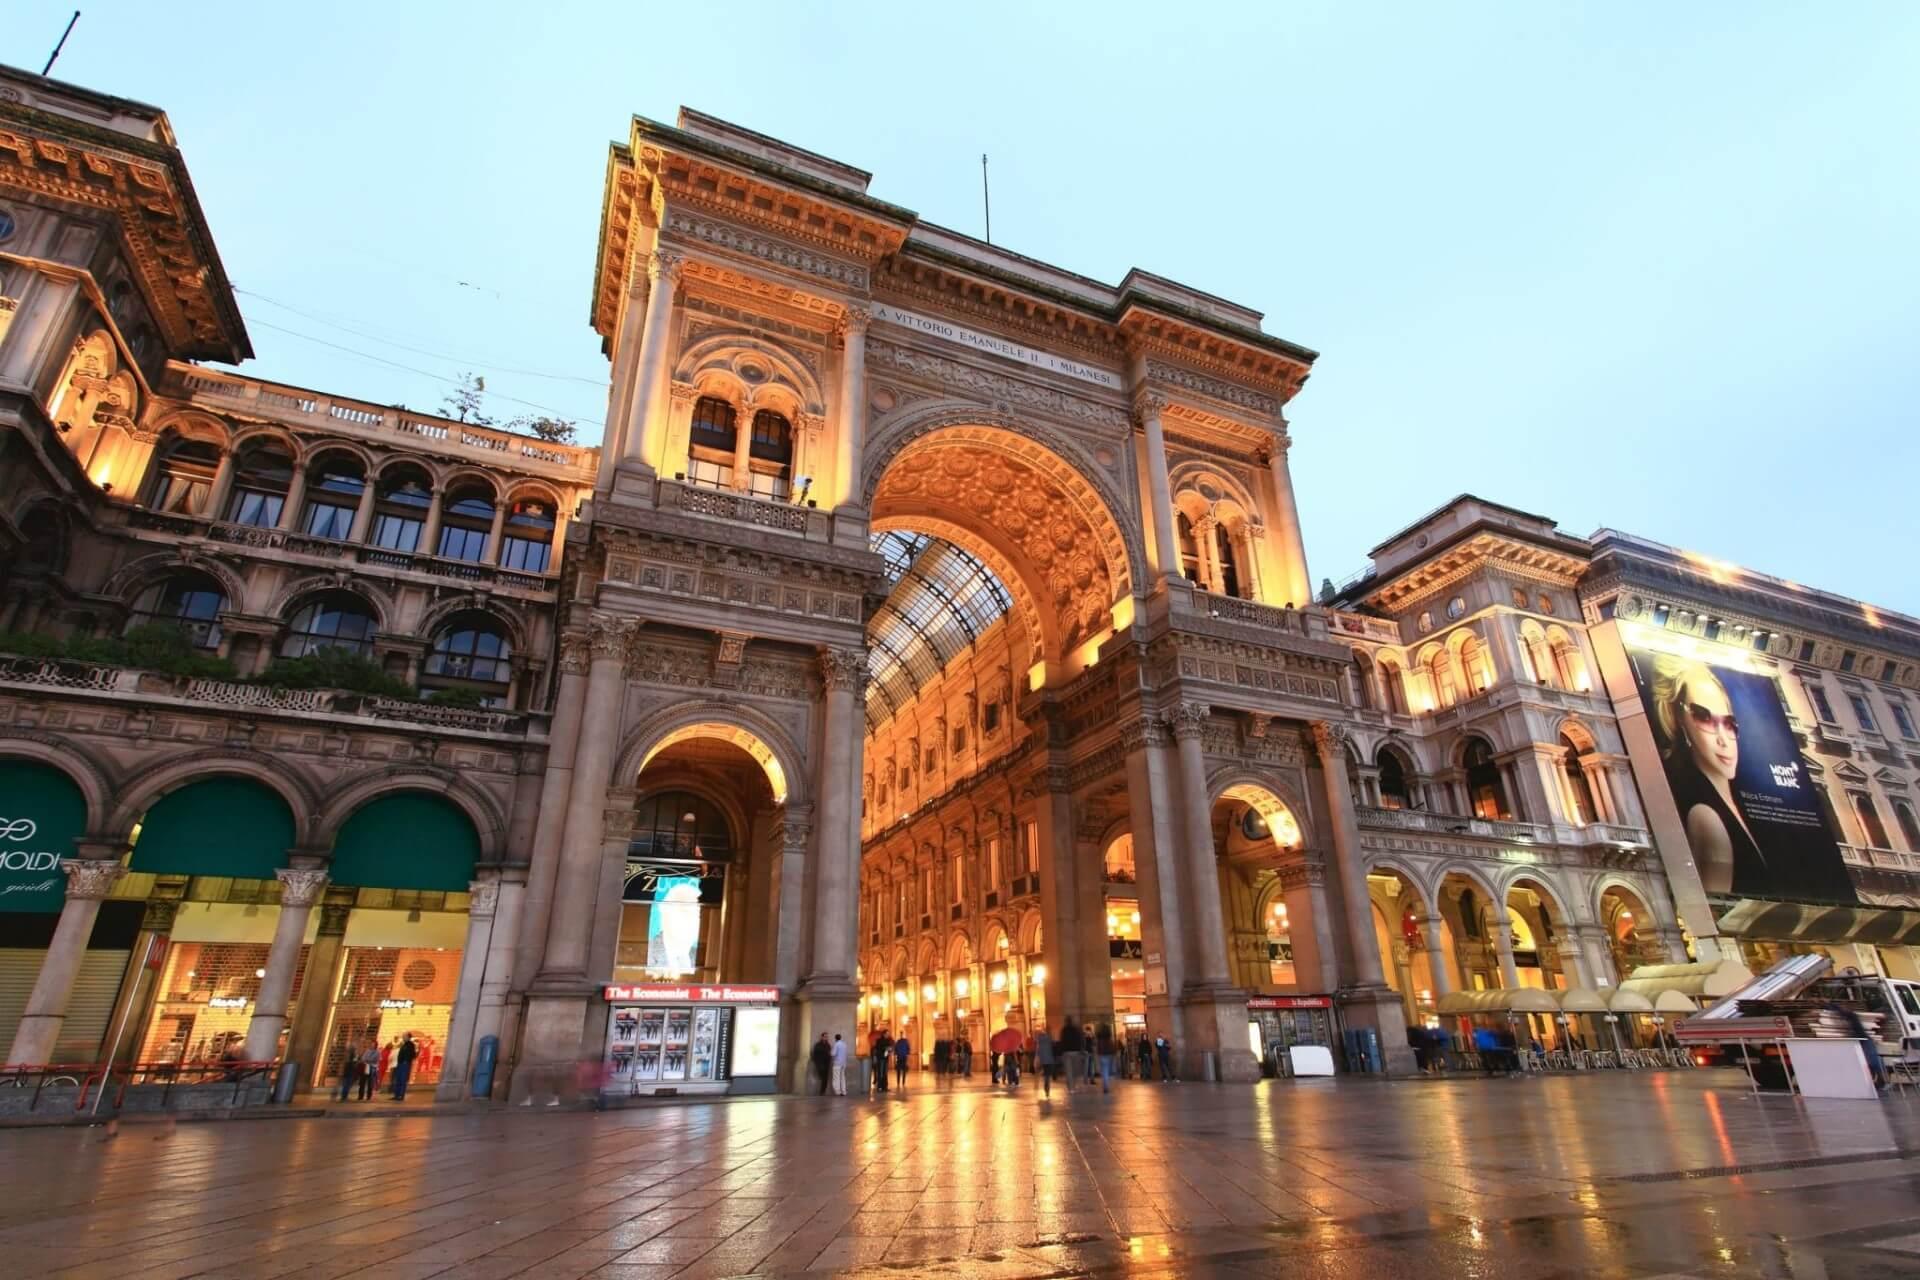 Week end à Milan : capitale de la mode